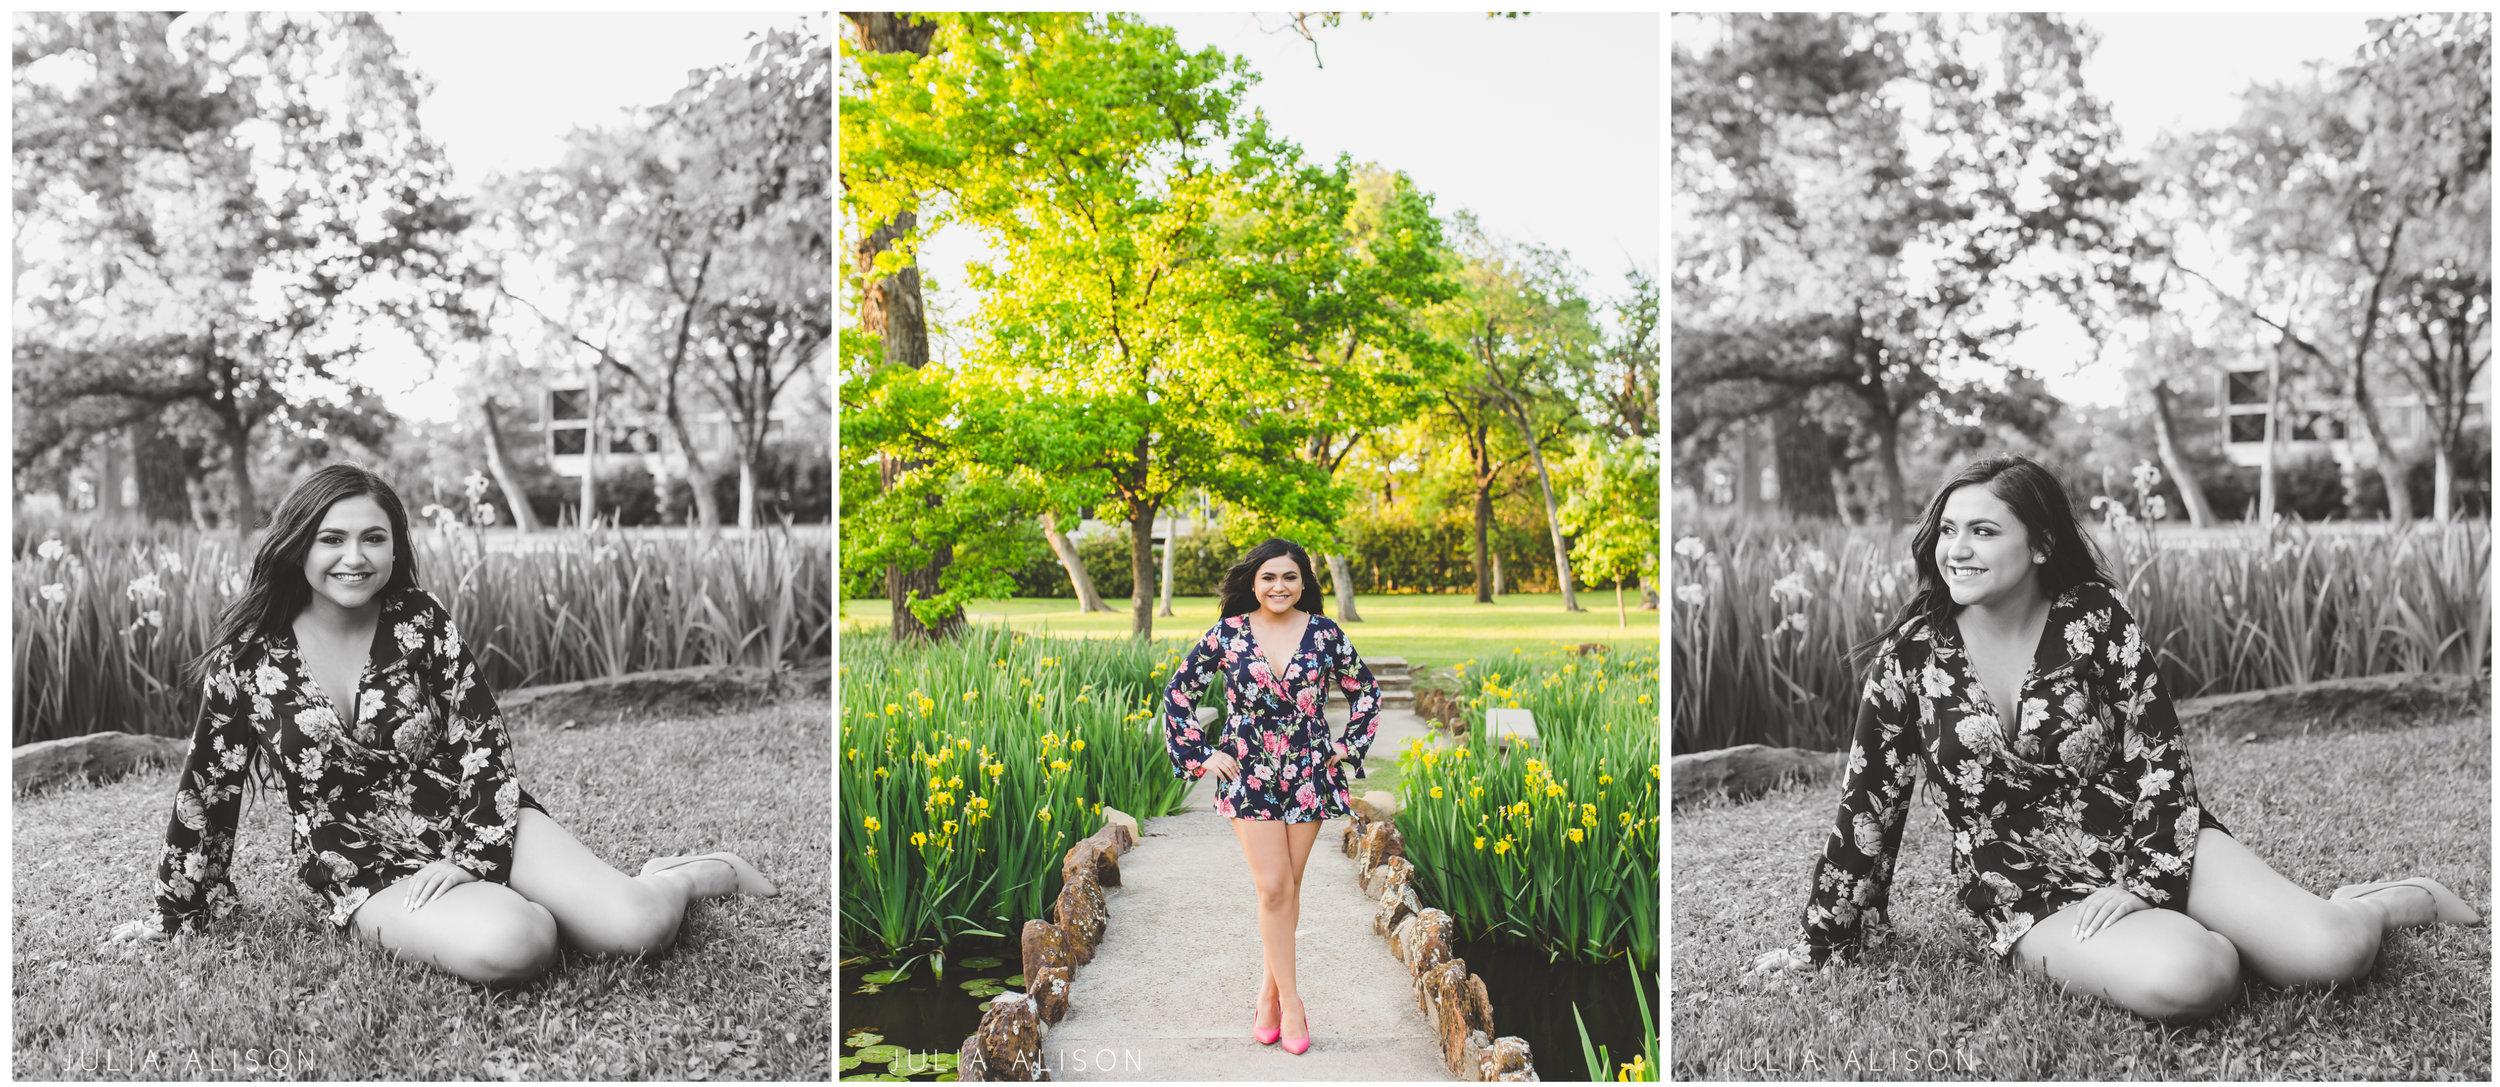 Lili FB Collage 1.jpg